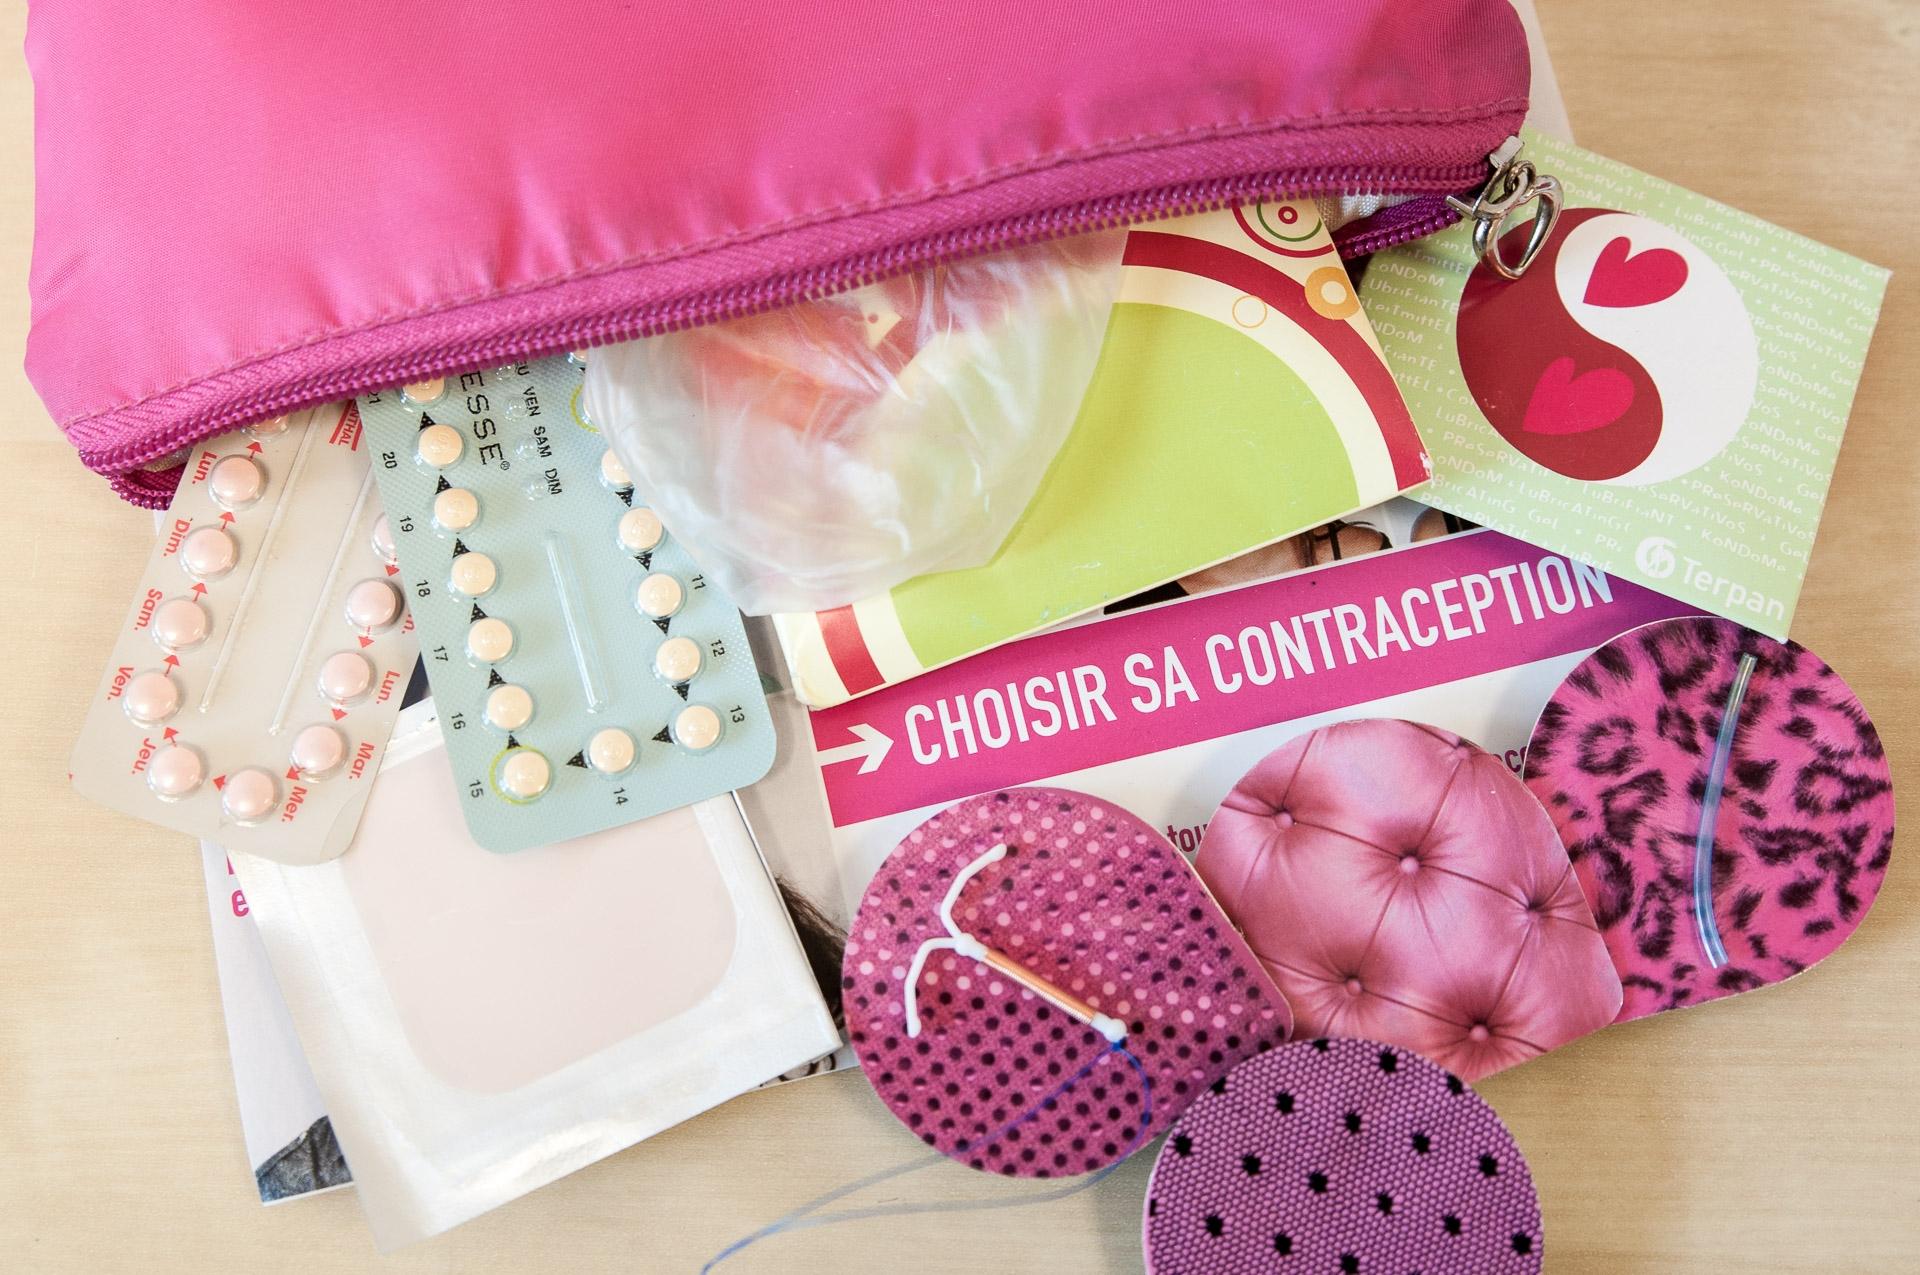 choisir-sa-contraception